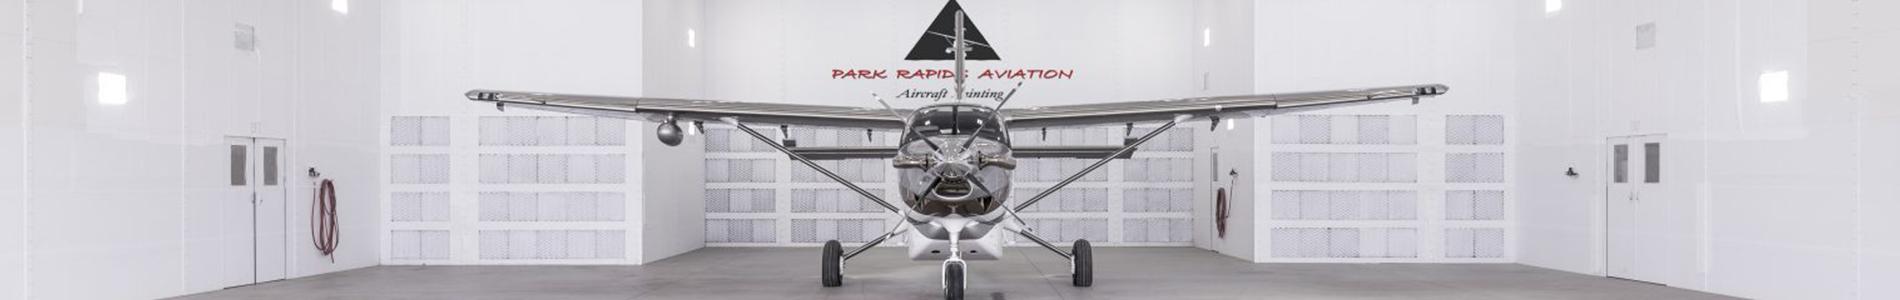 Aviation Metal Building